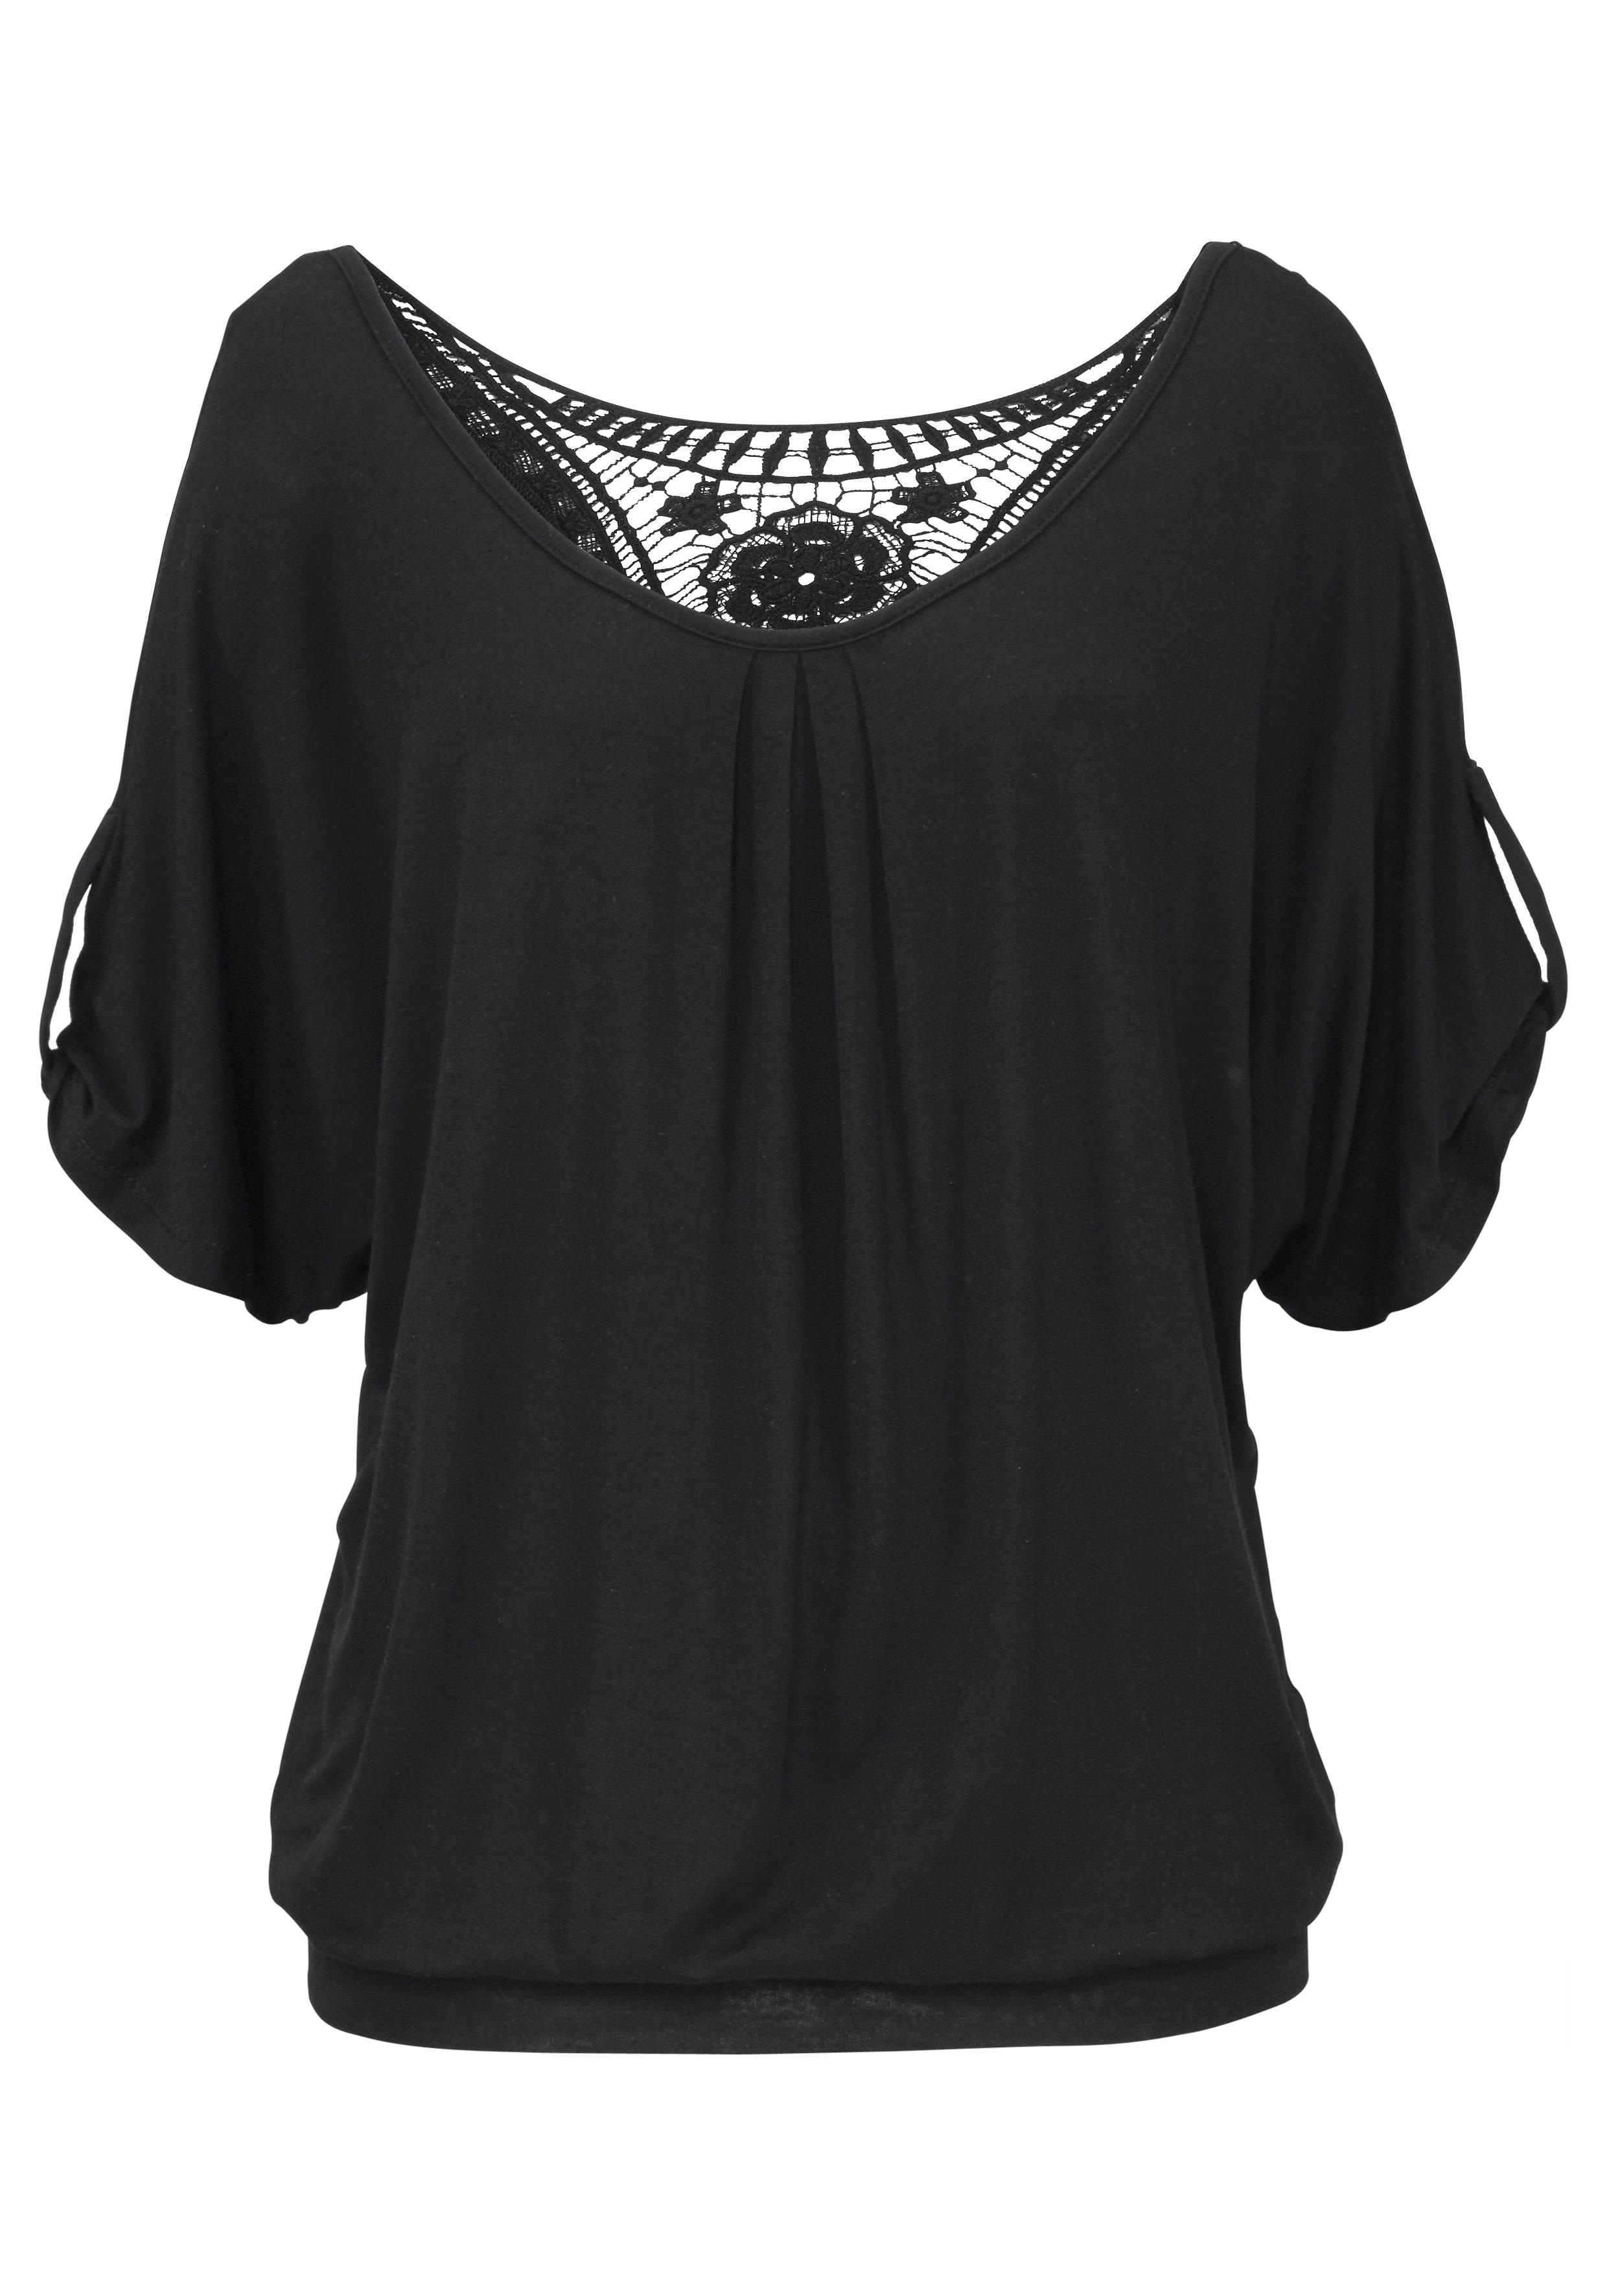 LASCANA Shirt met haakdetail achter goedkoop op lascana.nl kopen